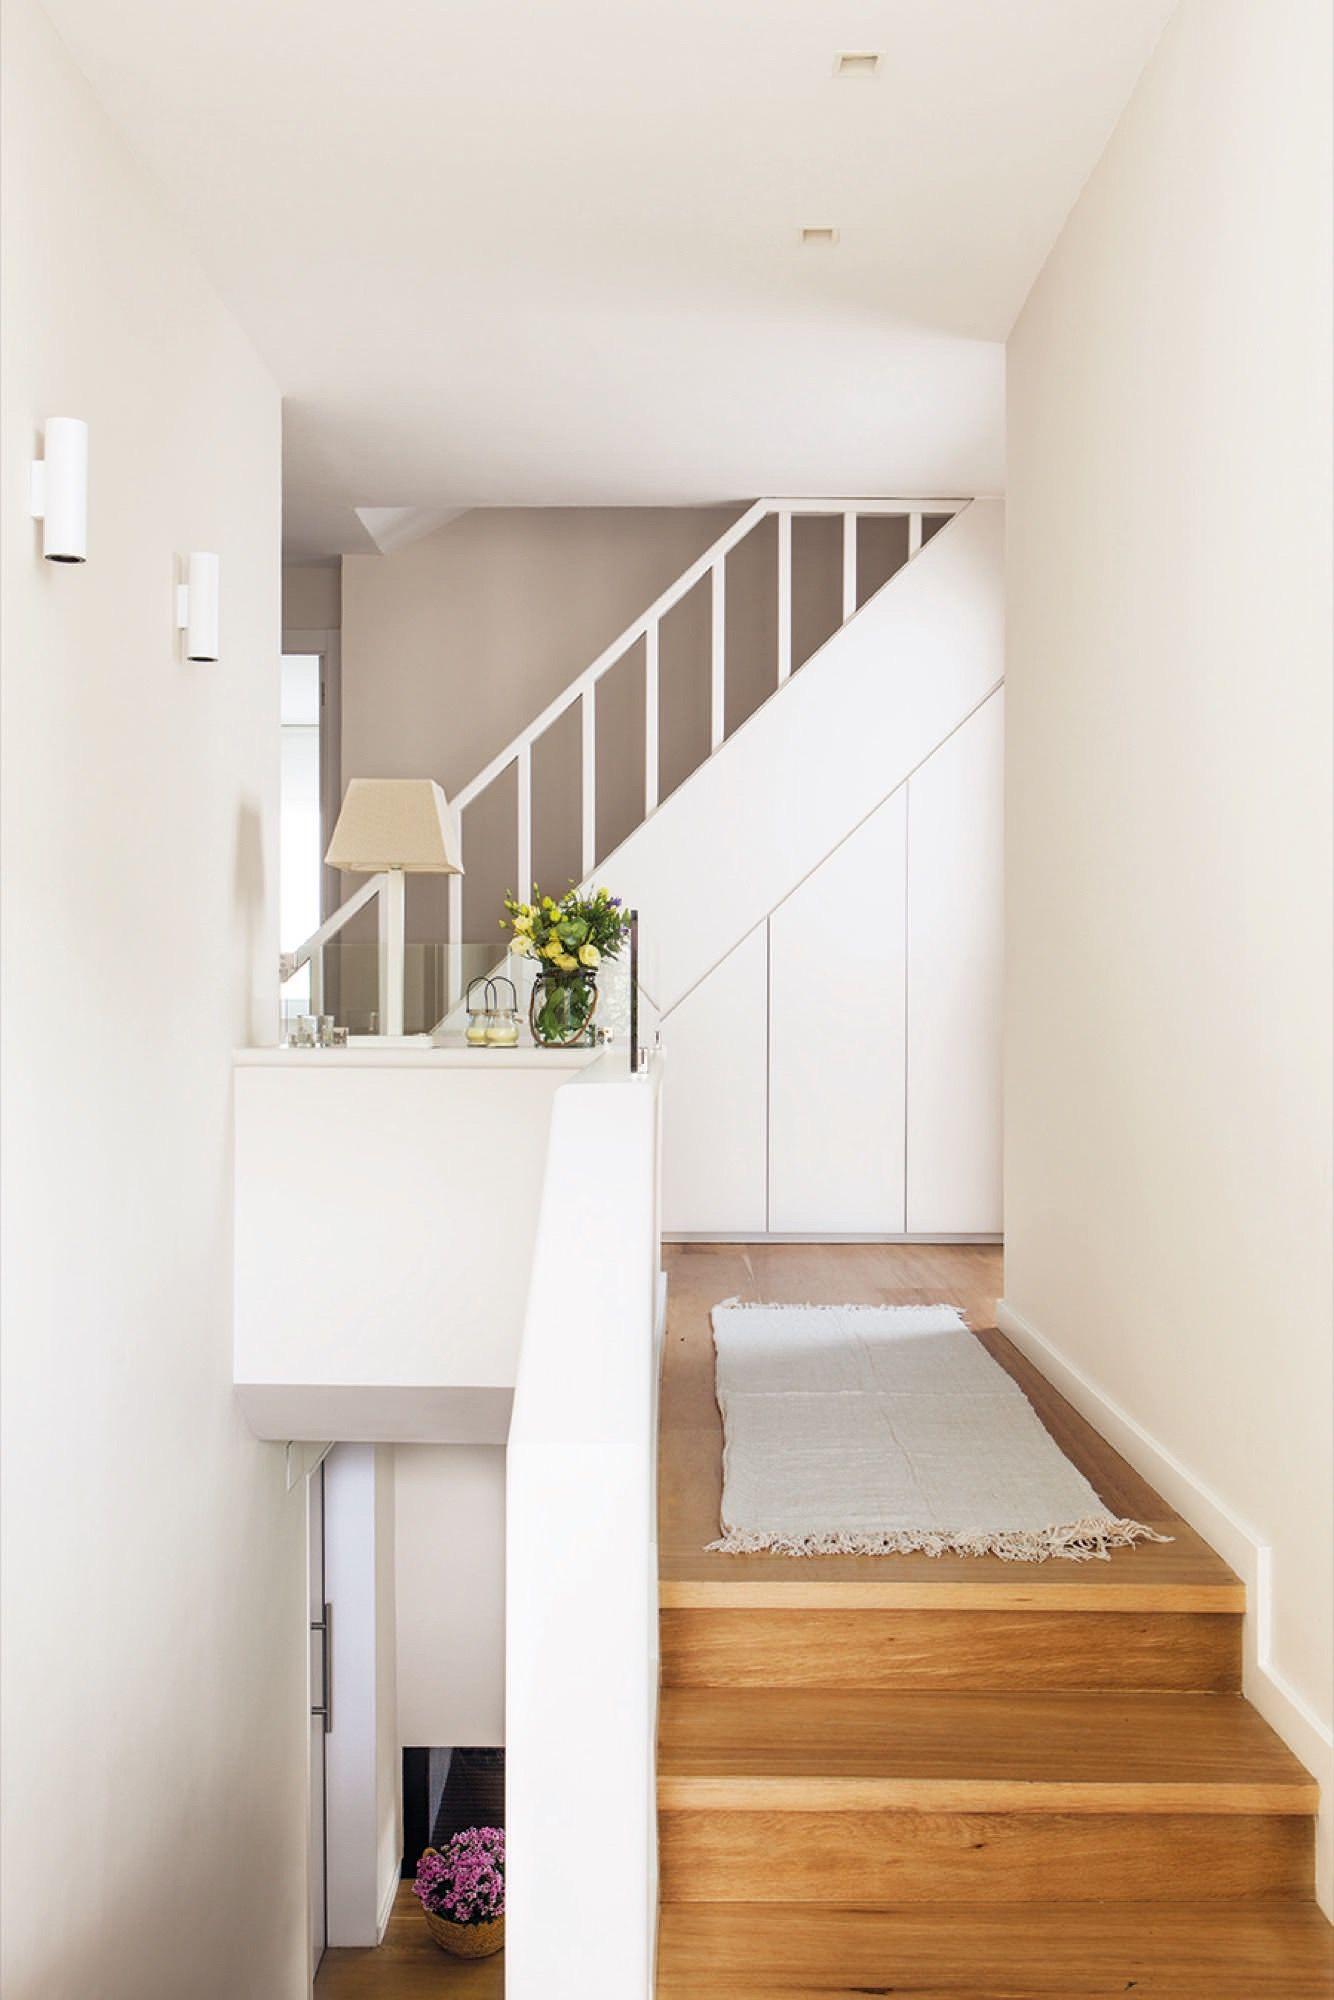 Los zapatos ocultos ideas para zonas de paso - Barandillas para escaleras interiores modernas ...